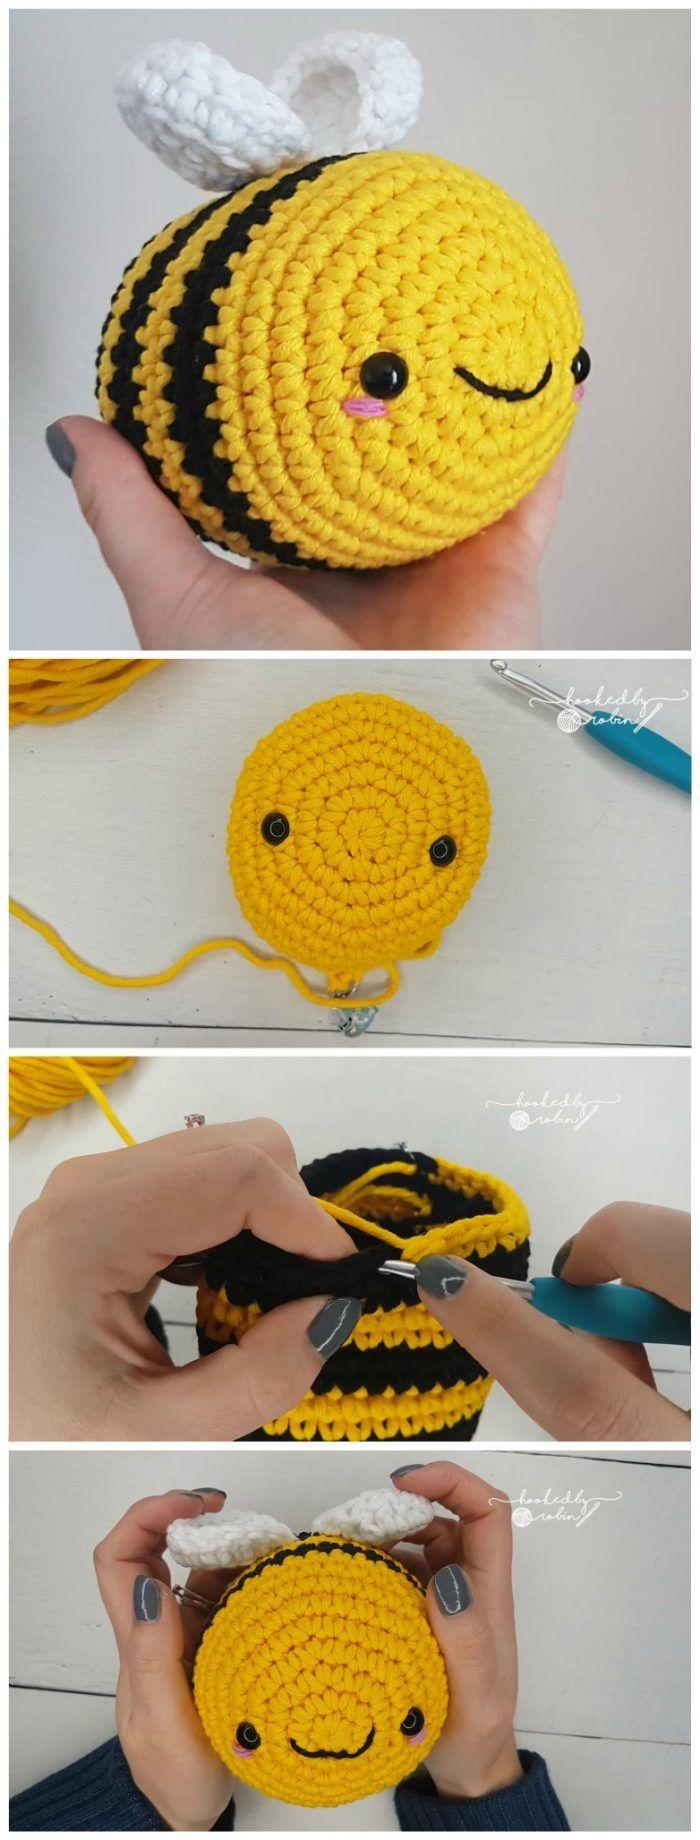 Amigurumi Bumblebee Free Crochet Pattern – YARN & HOOKS